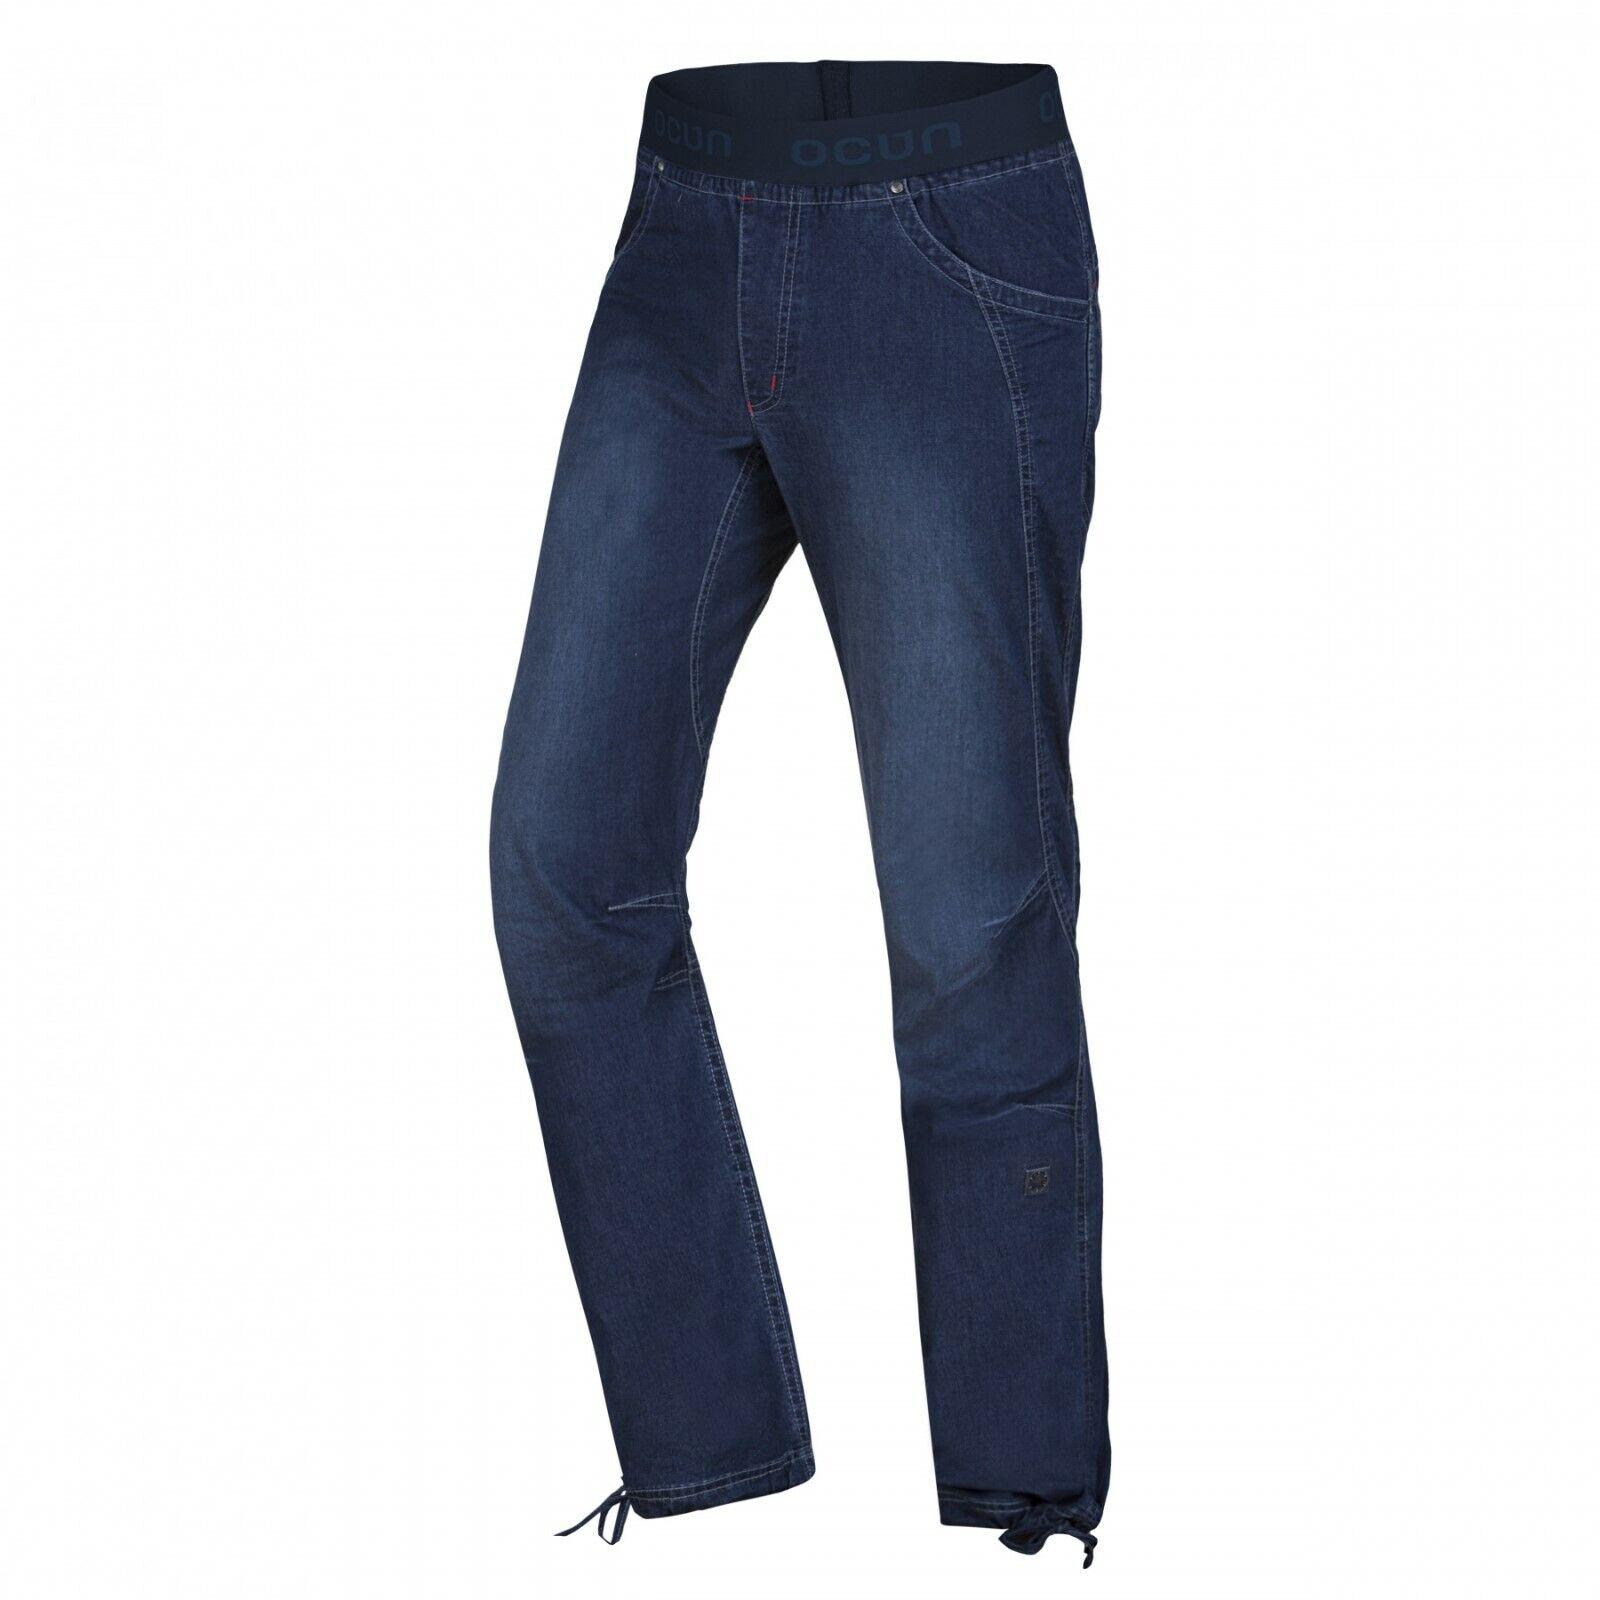 Ocun Mania Mania Mania Vaqueros Ligero Elástico Boulderjeans Pantalones Escalada para Hombre 80c2dd